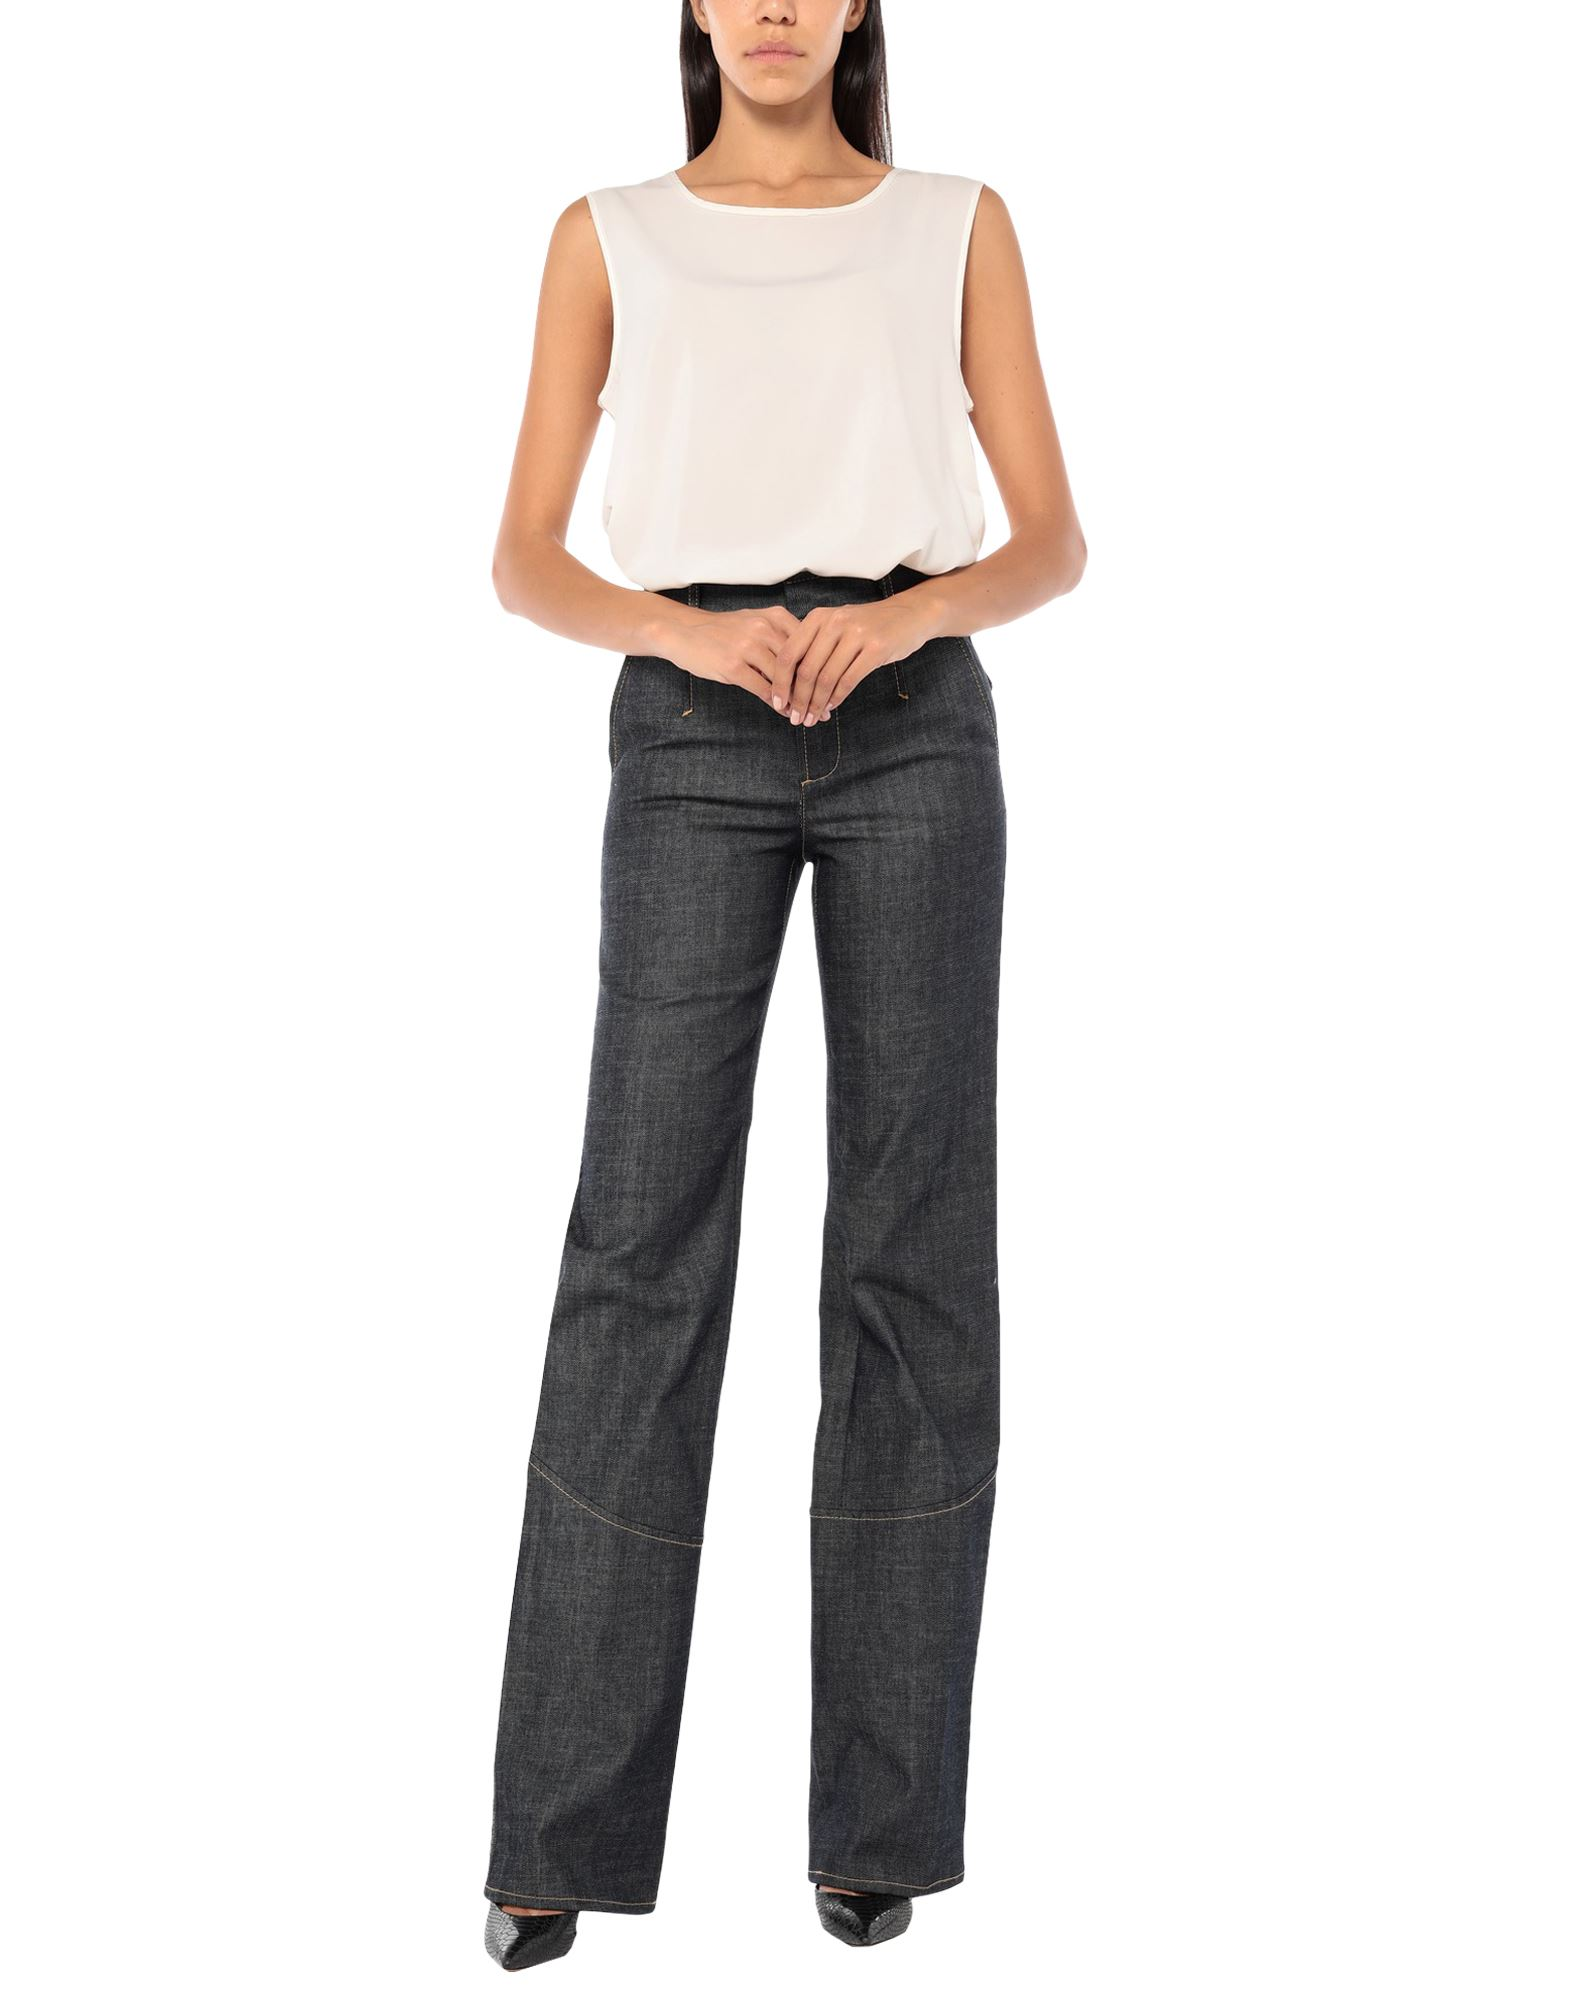 DSQUARED2 Denim pants - Item 42819863